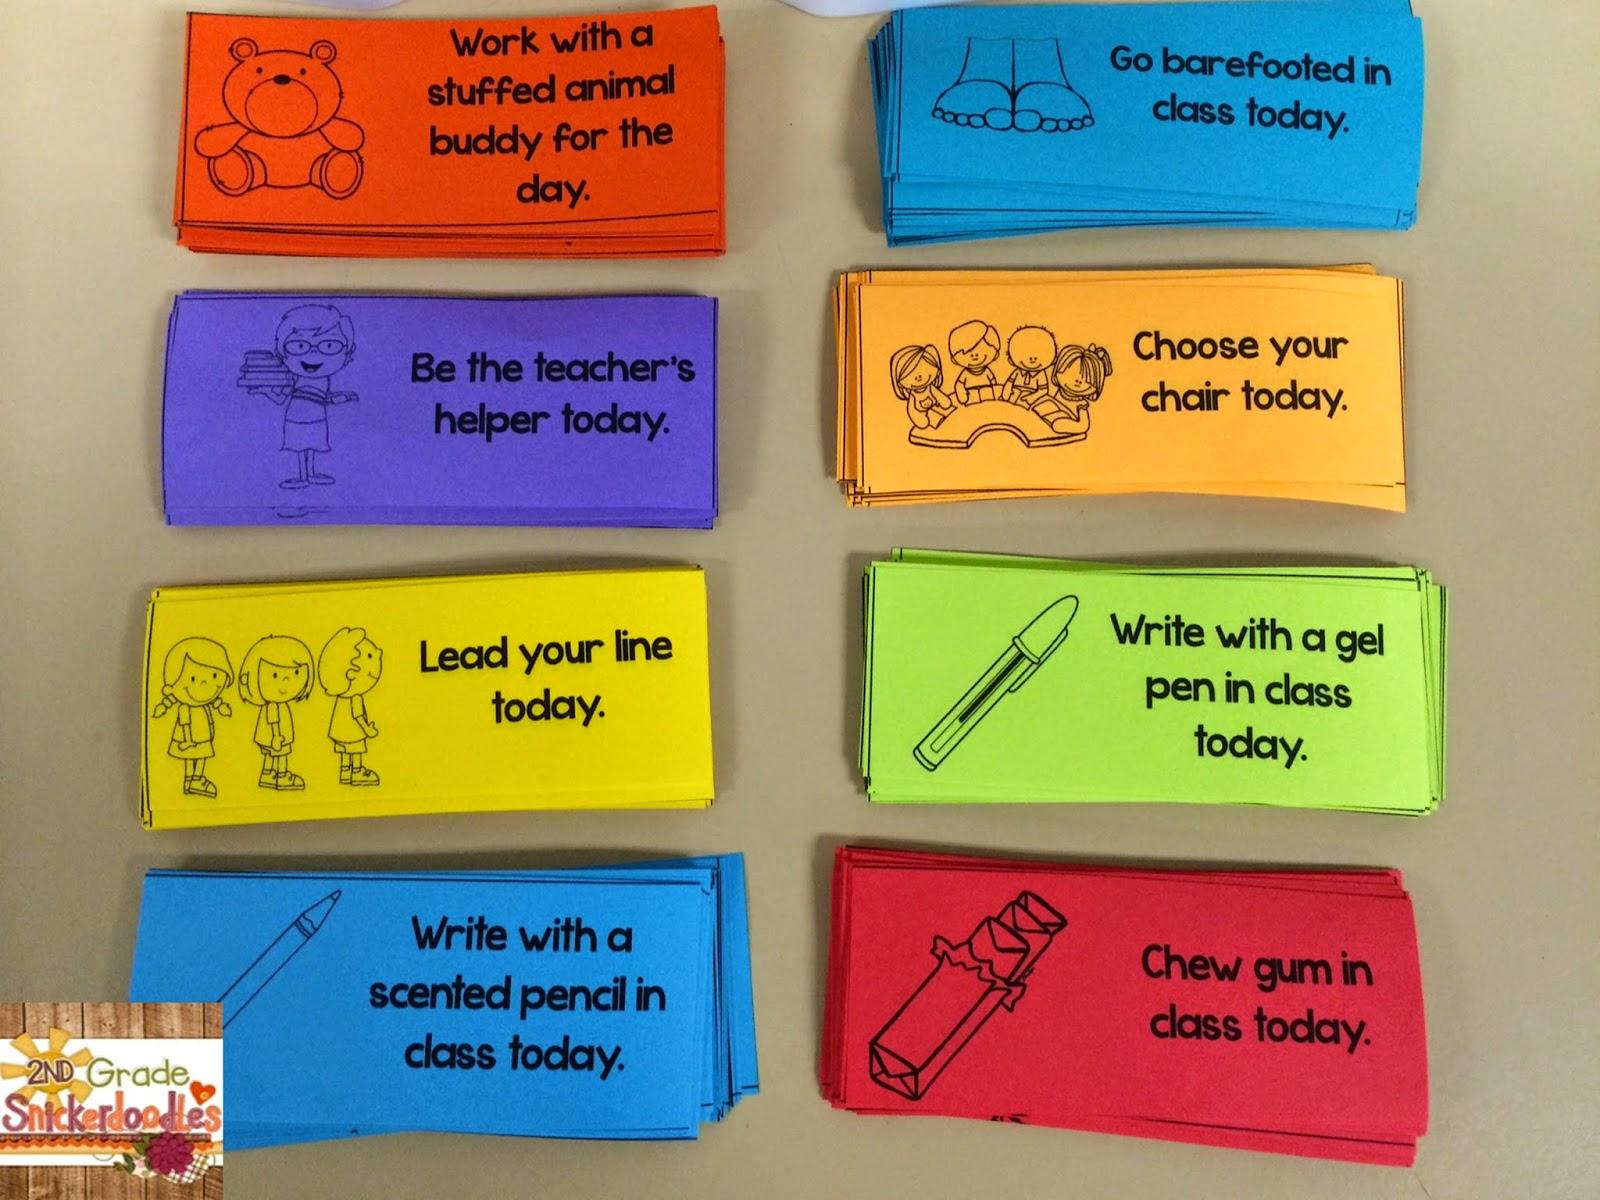 2nd Grade Snickerdoodles: Behavior Management Tips {Freebie}